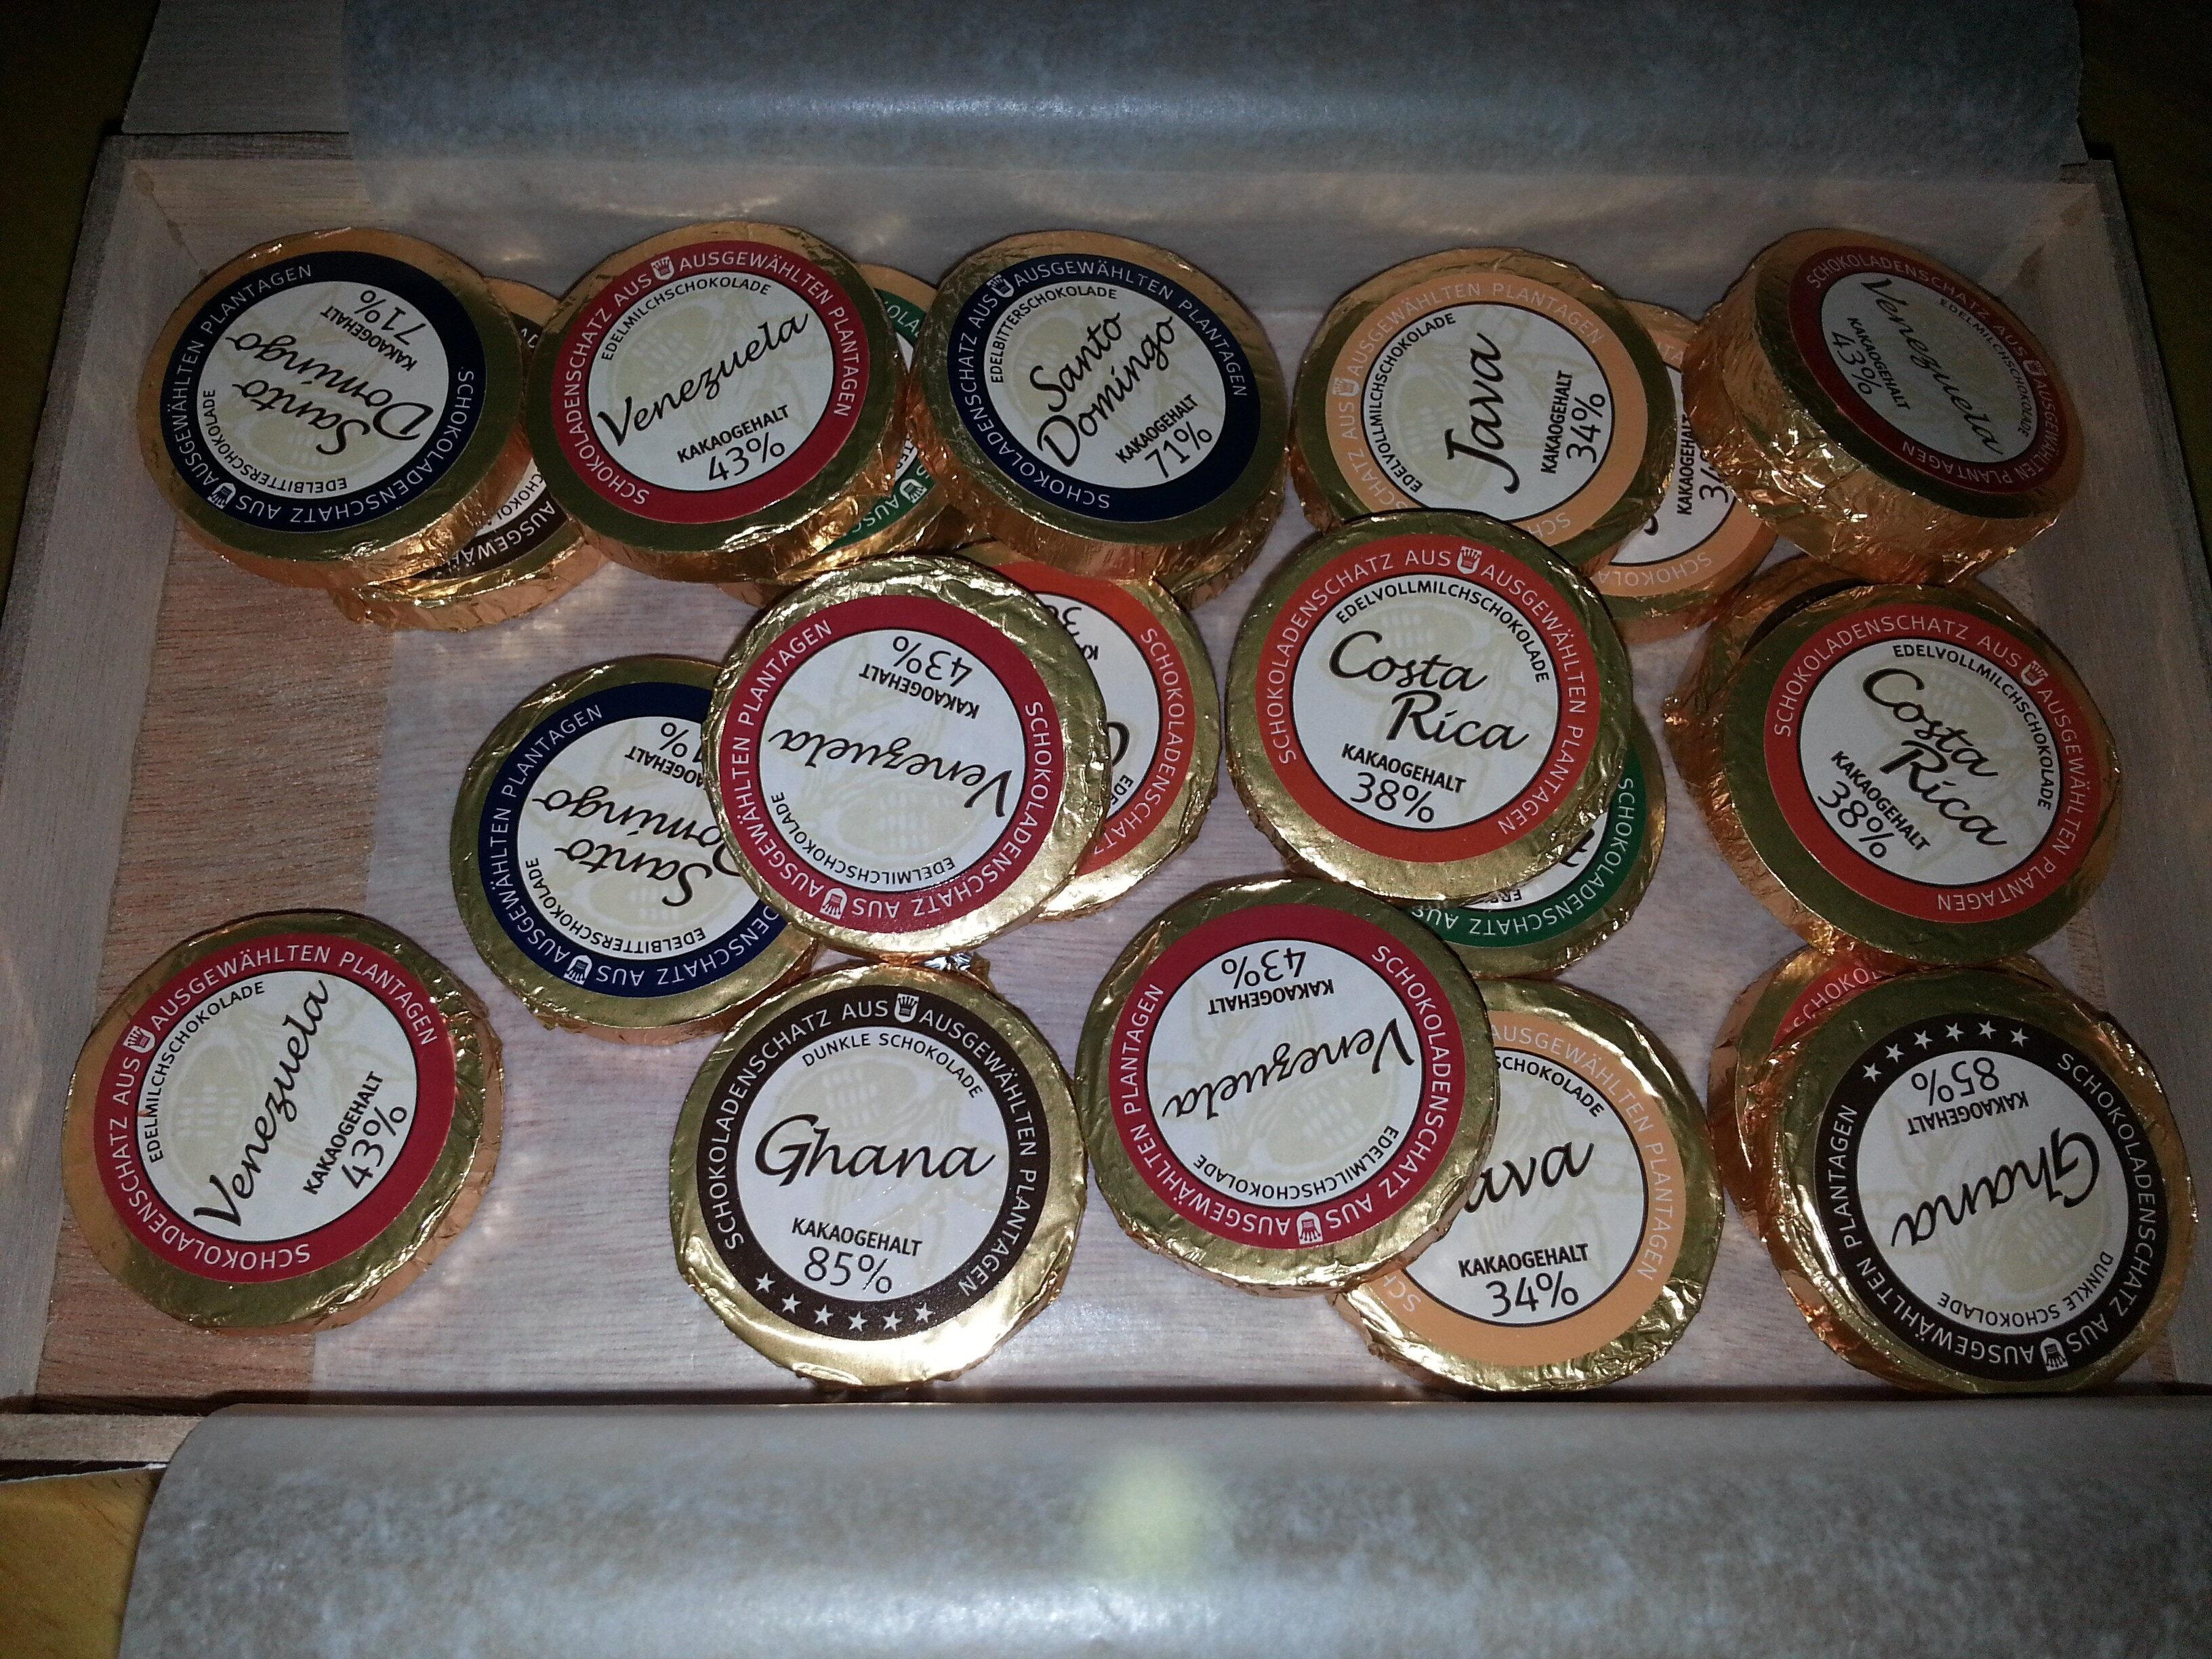 Holzkiste mit 45 Golddublonen - Product - de